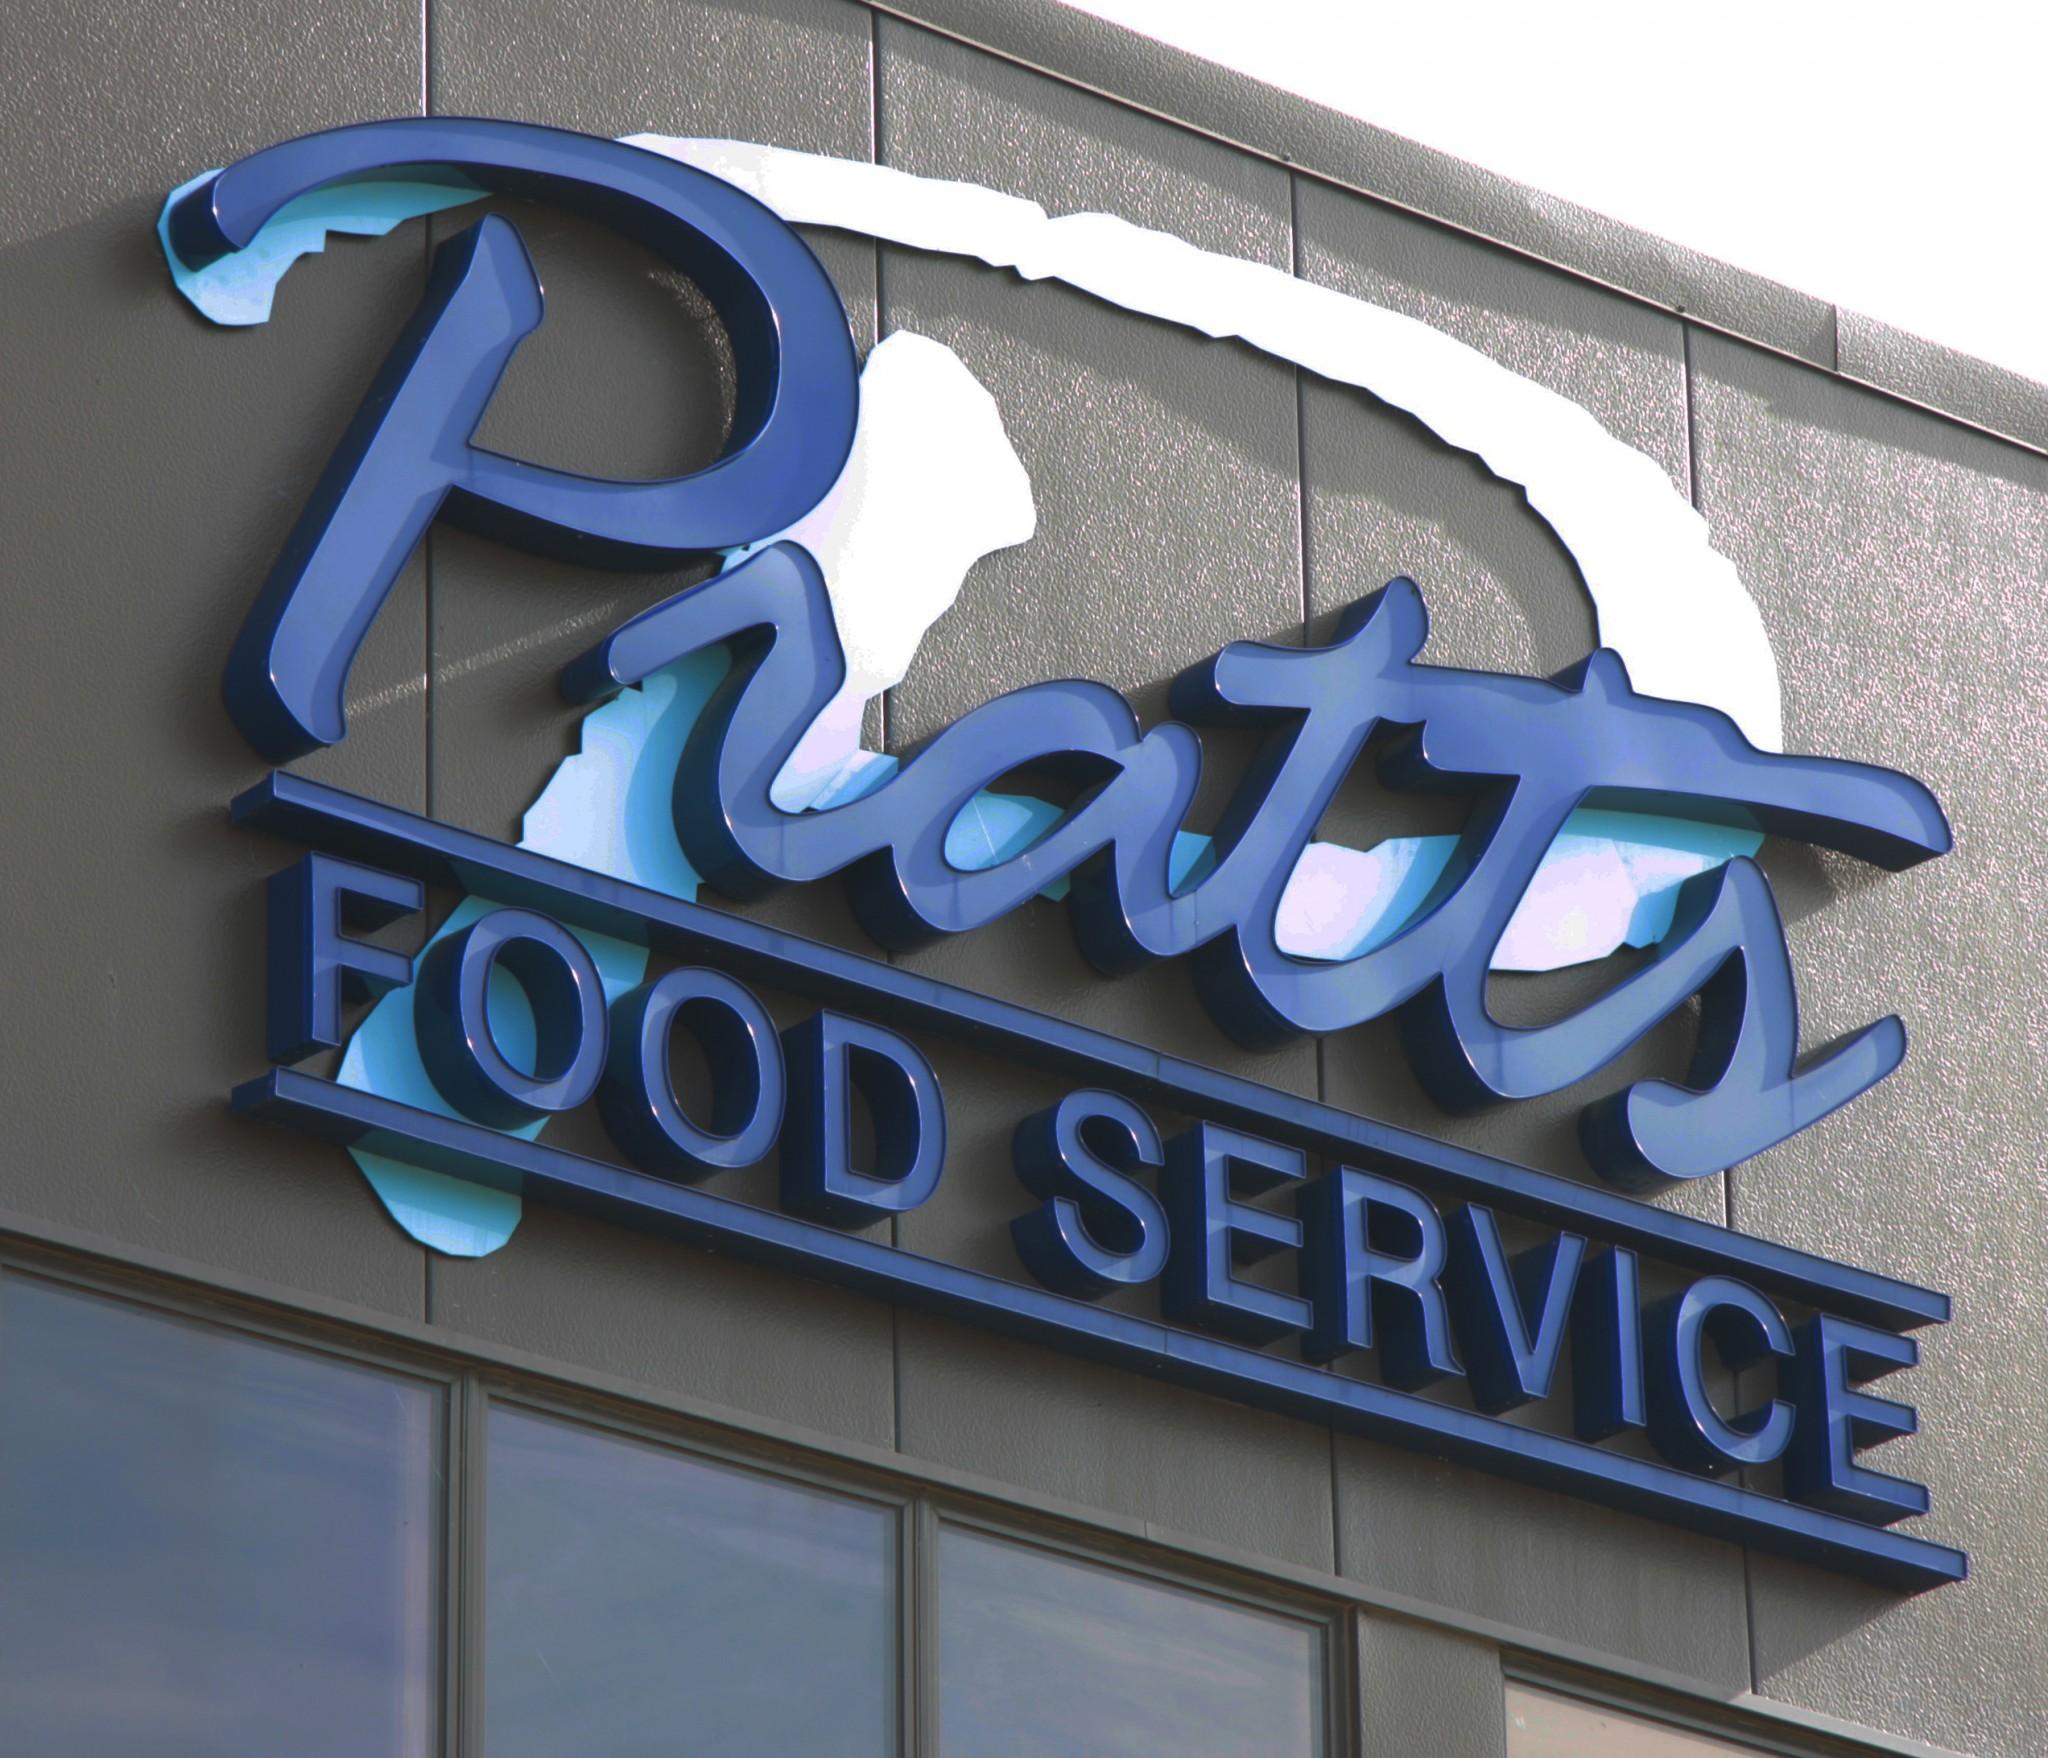 Pratts Food Services